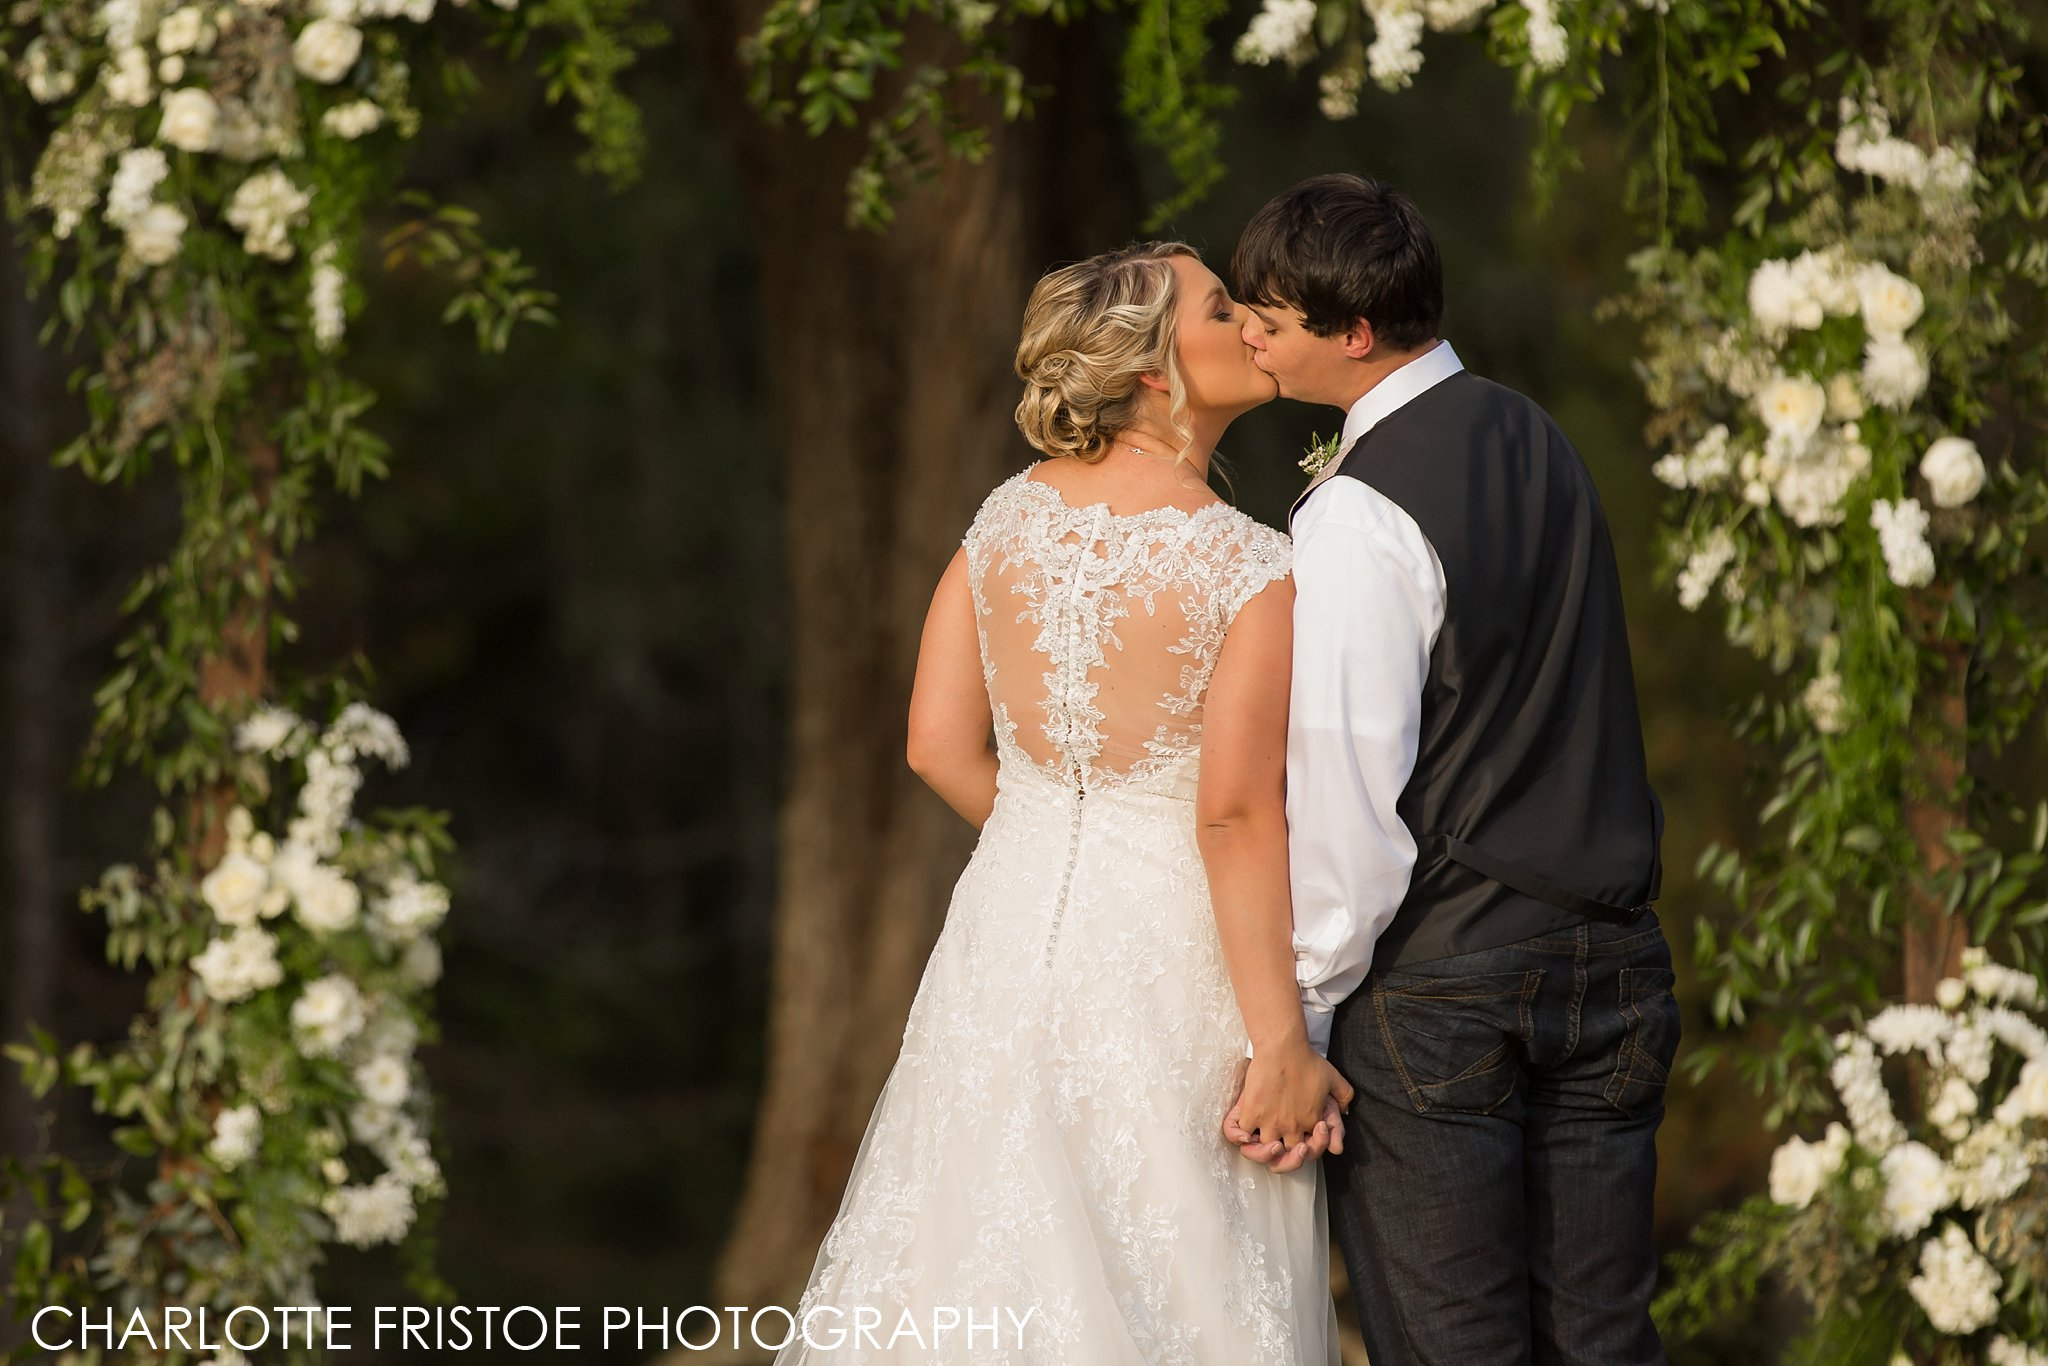 Charlotte Fristoe Photography-58.jpg